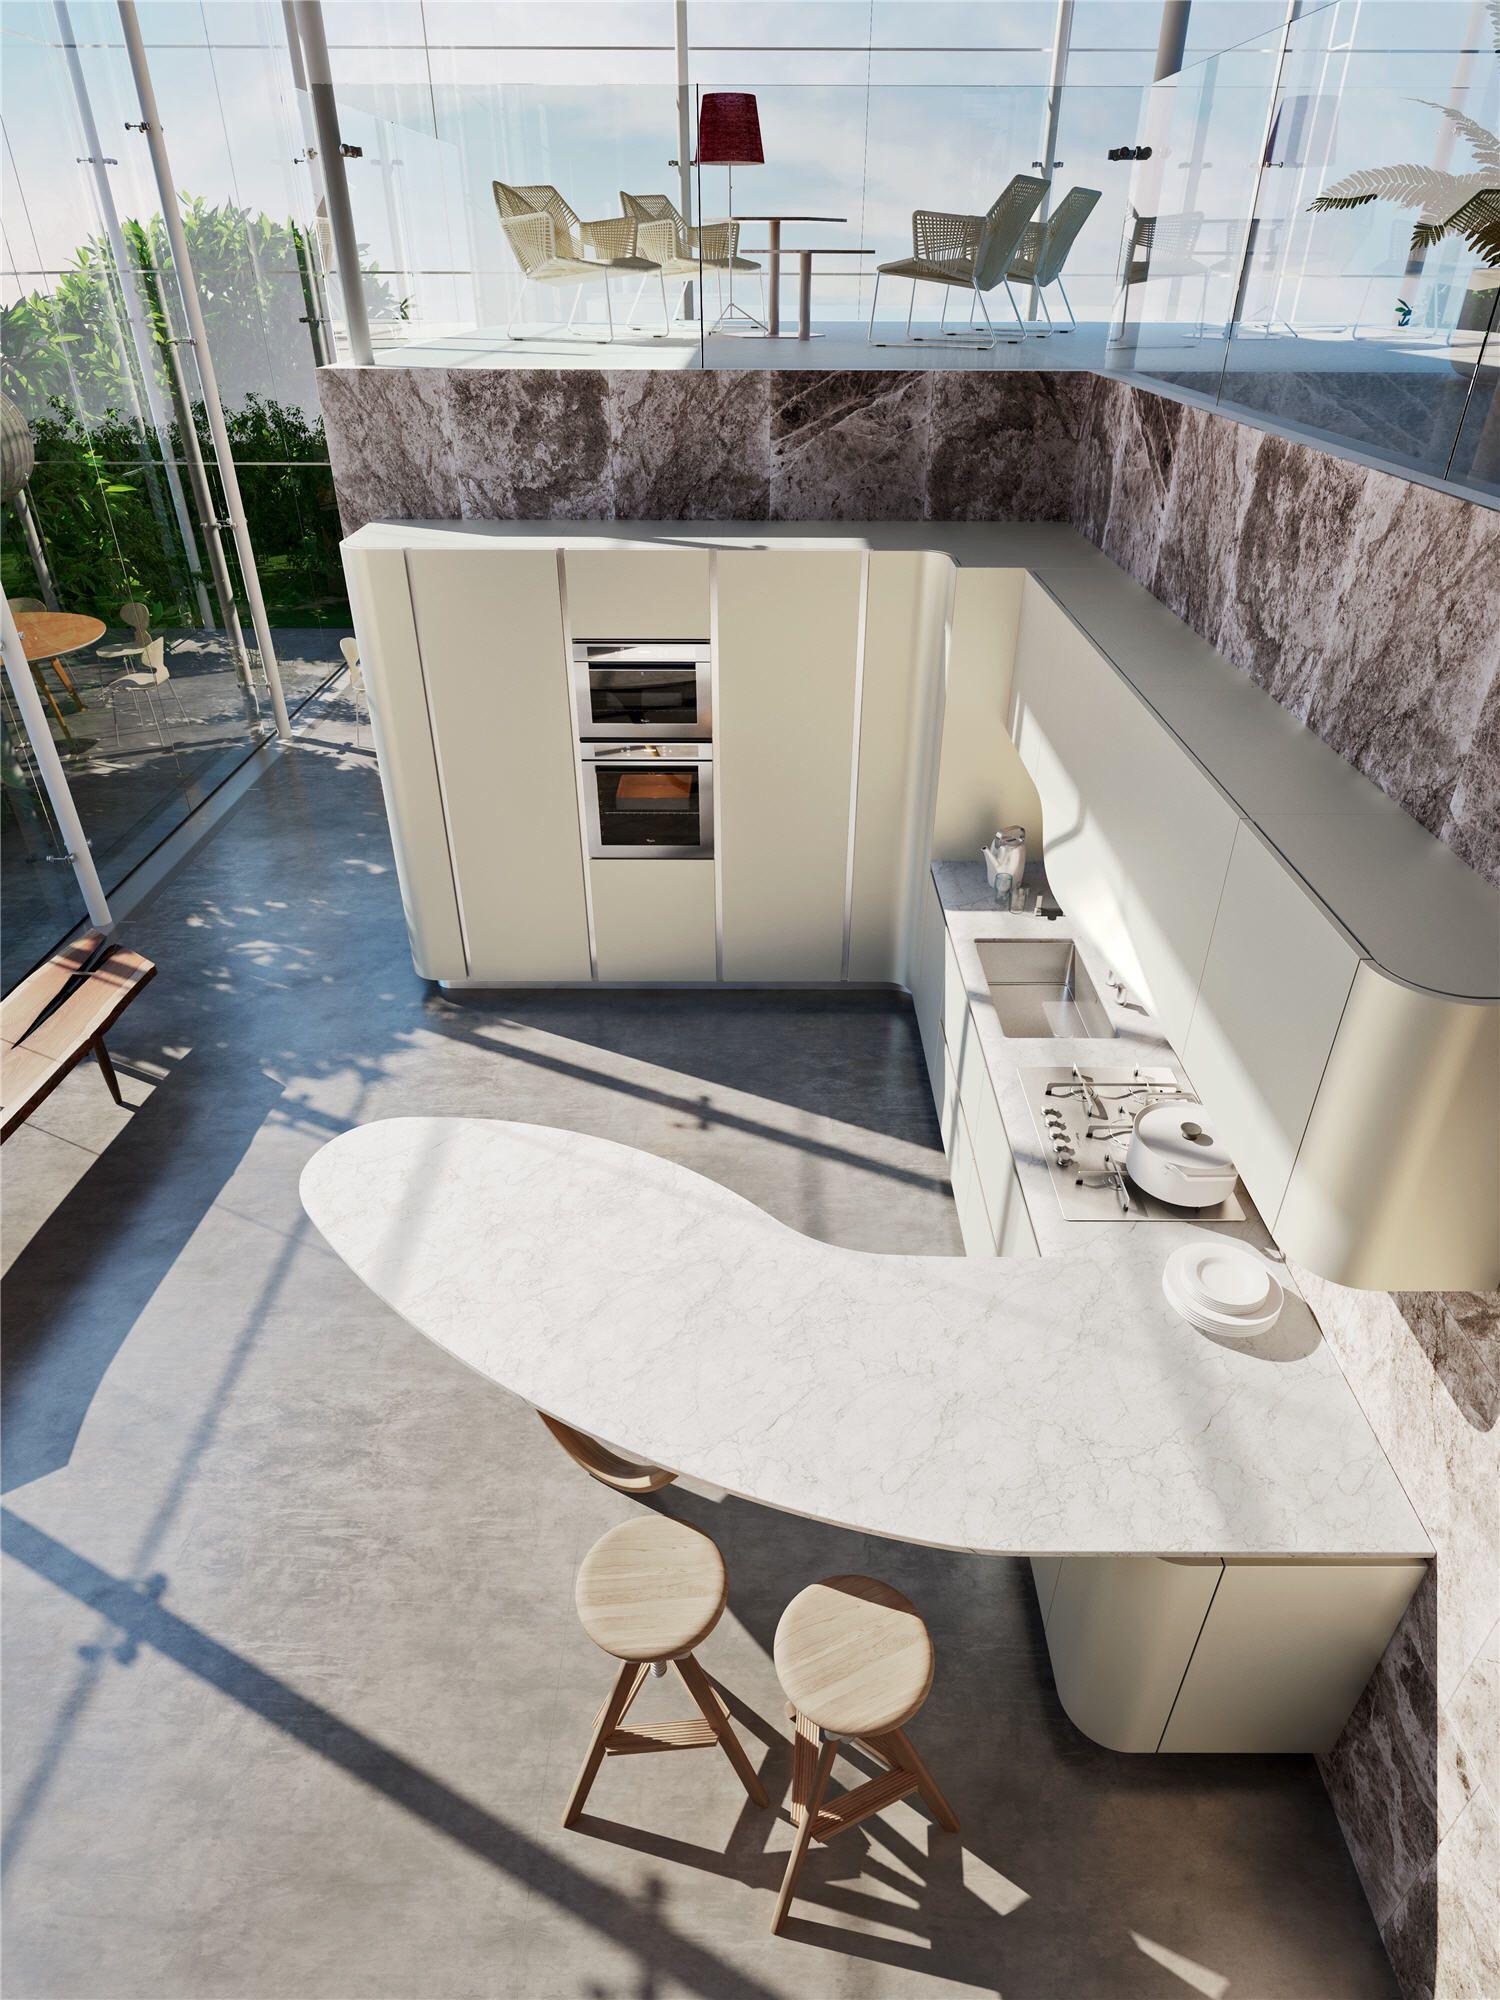 Snaidero, Ola 20, Pininfarina Design | Dreamy elegance in ...